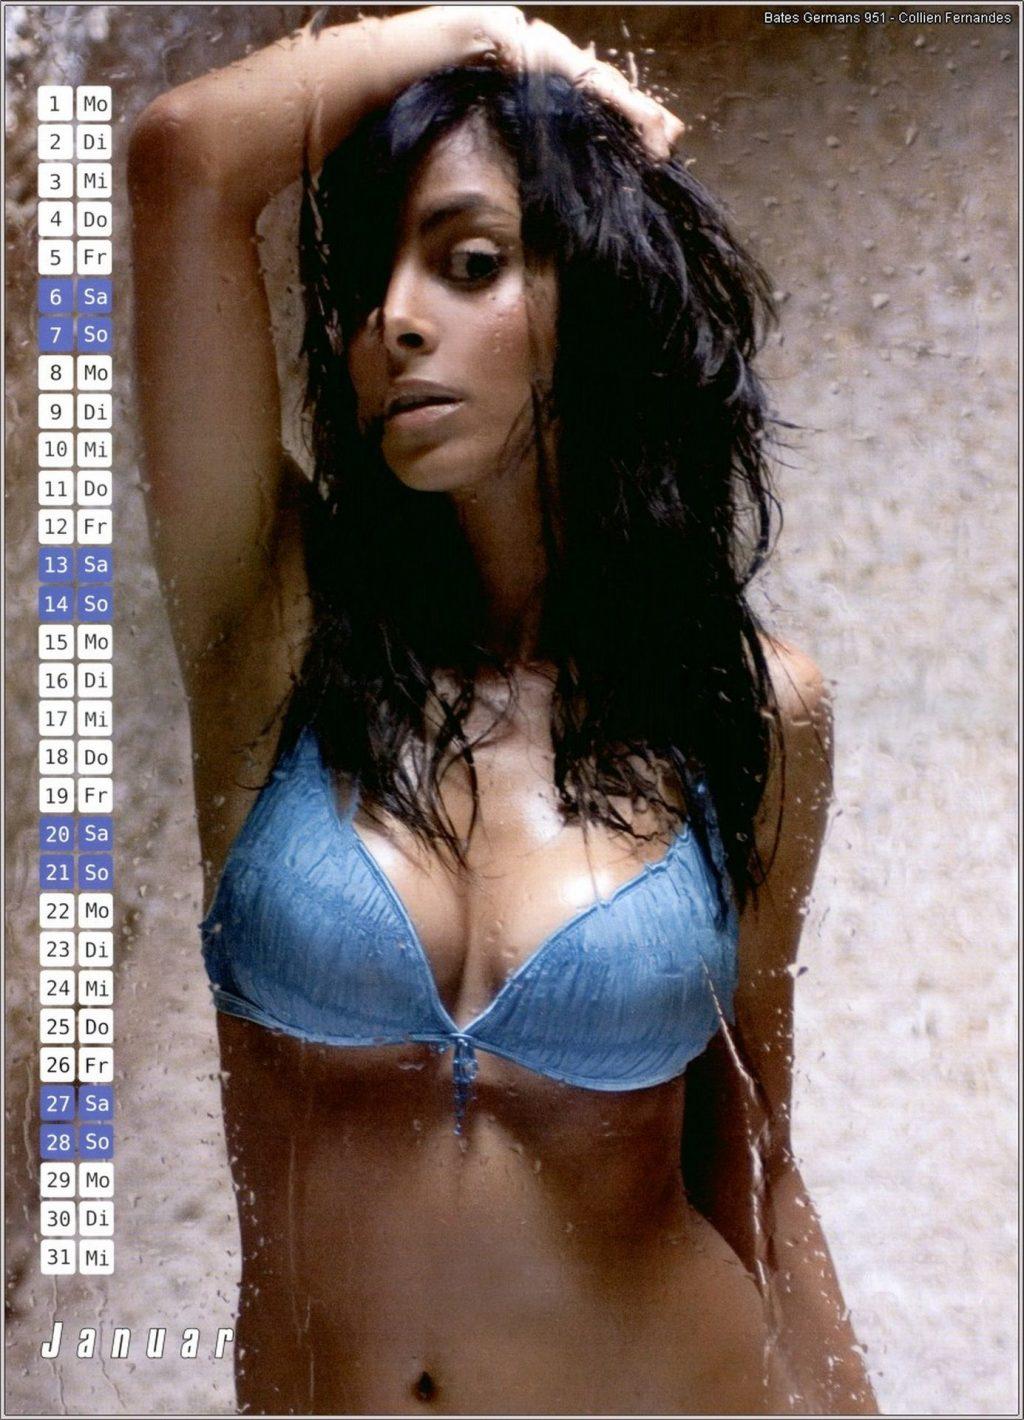 Collien Ulmen-Fernandes Sexy & Topless Collection – Part 1 (150 Photos + Videos)